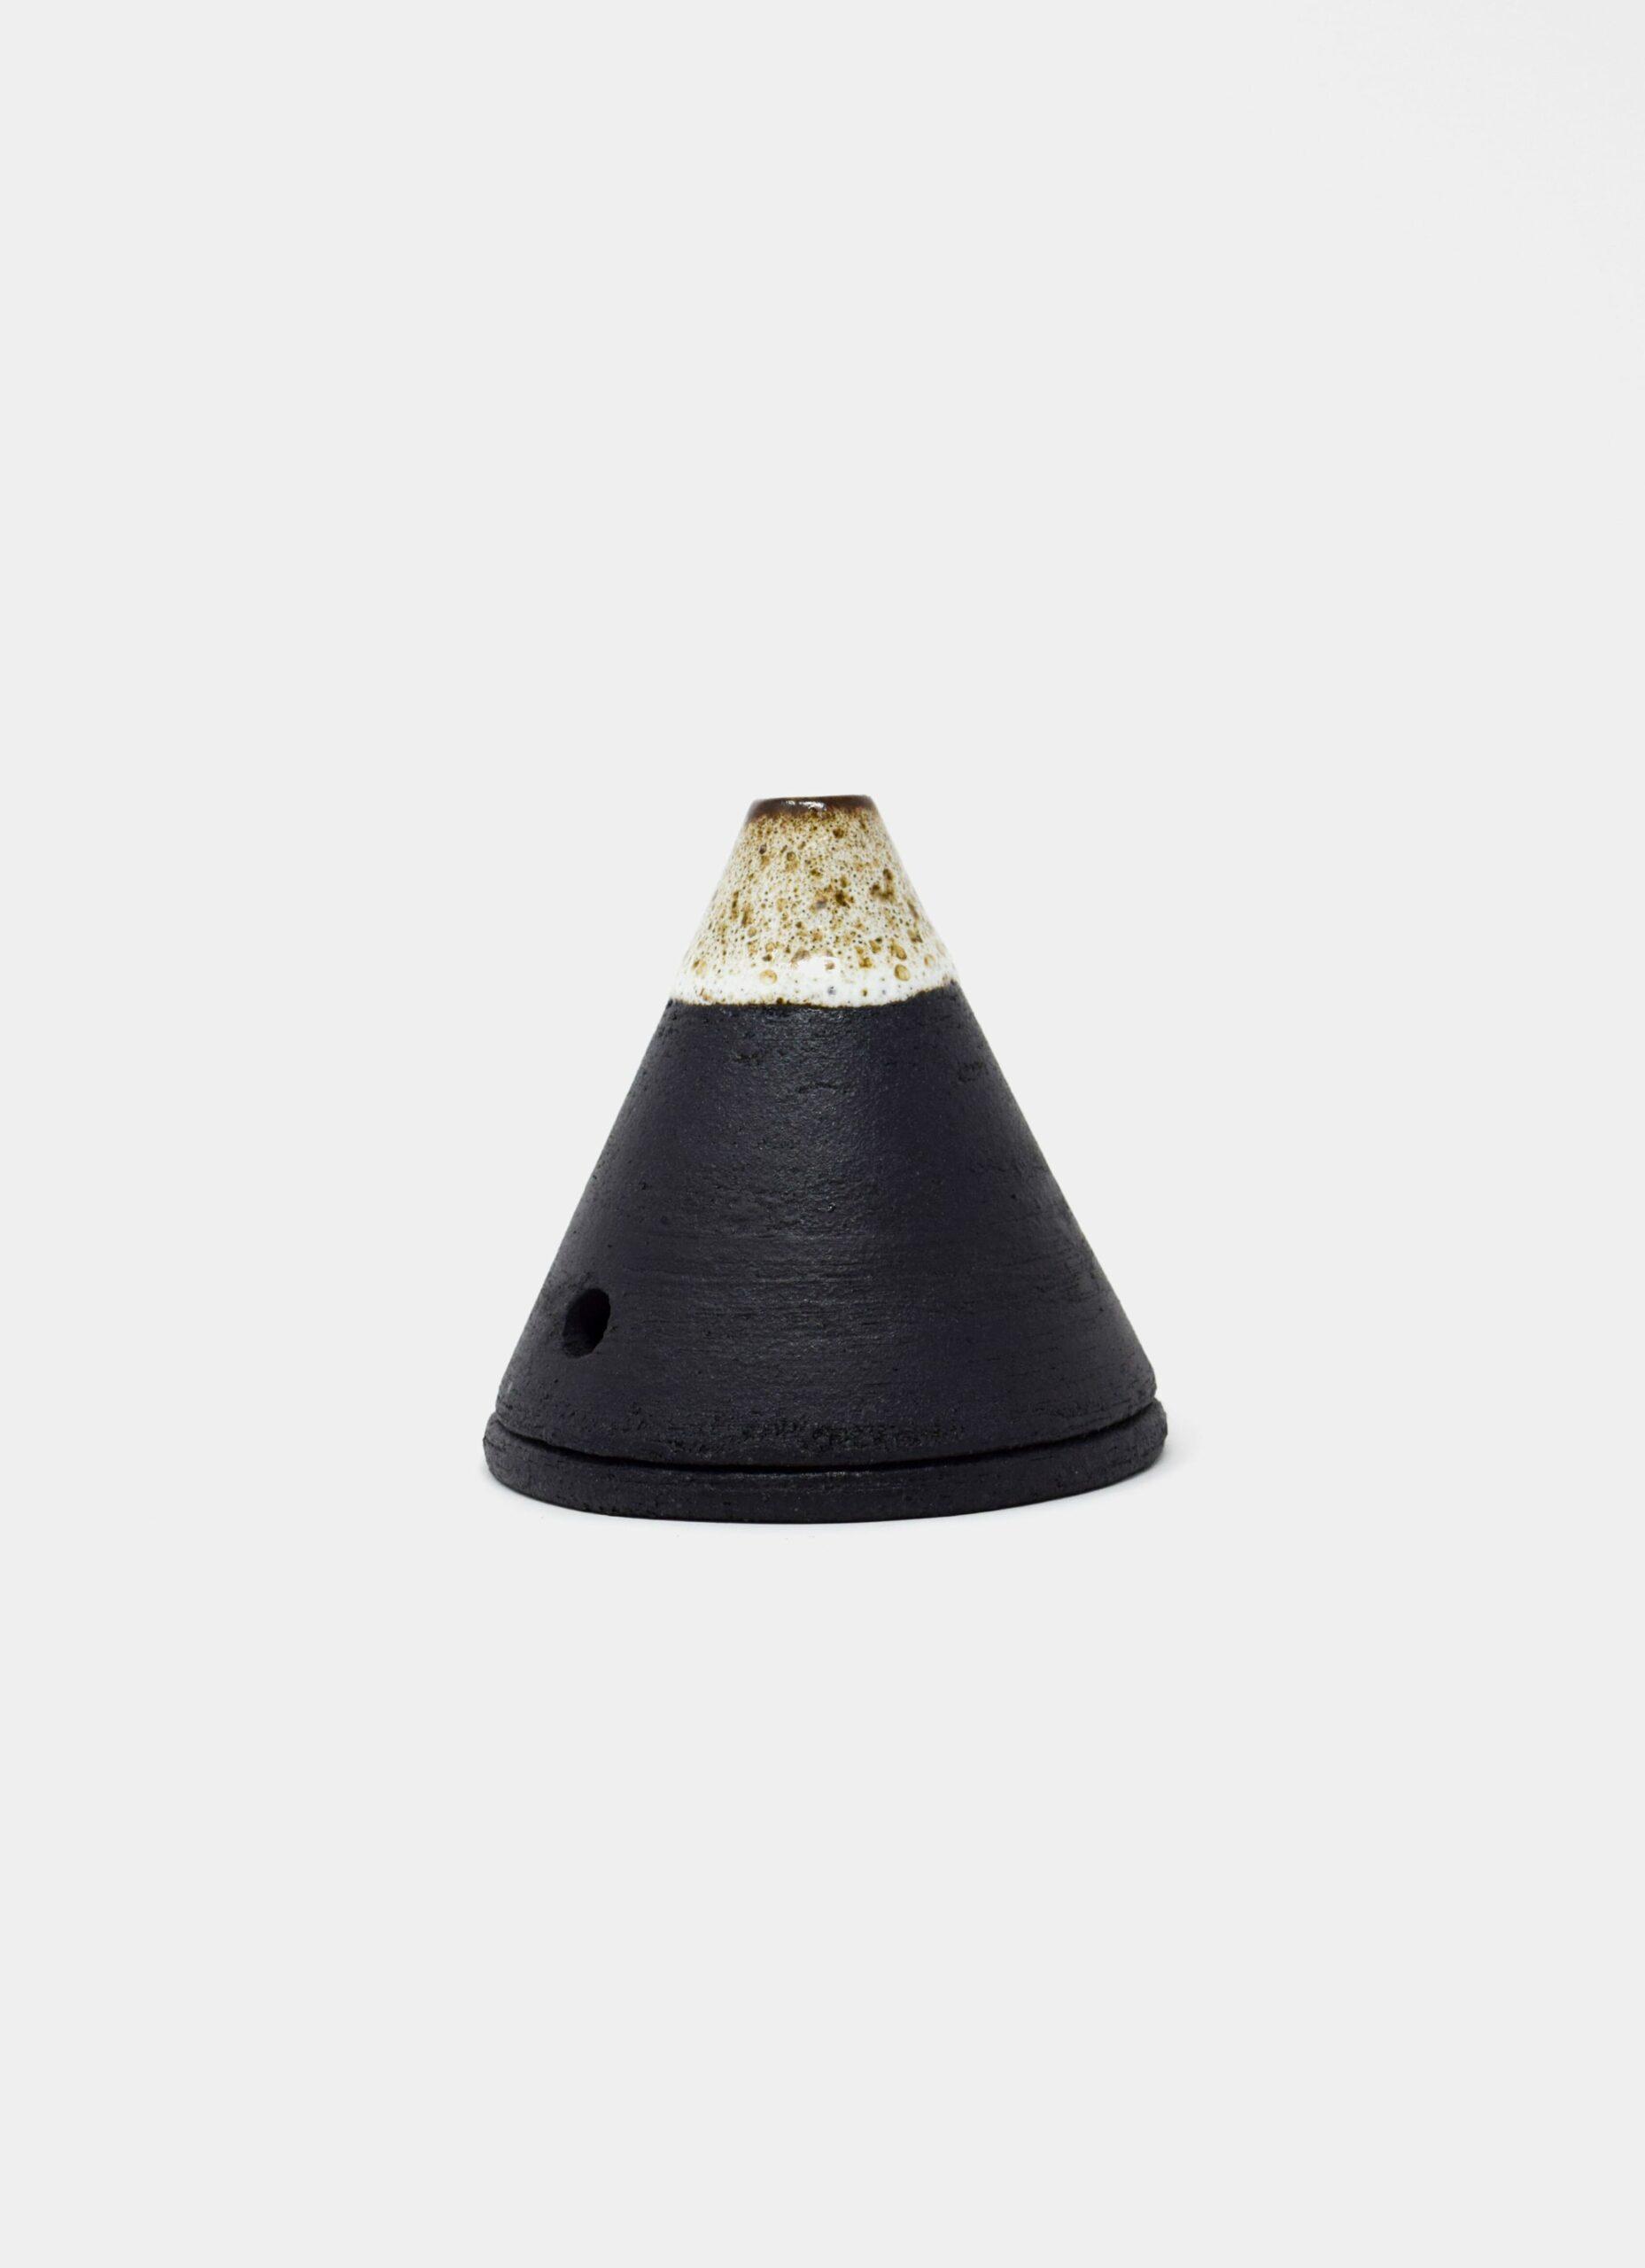 Studio Arhoj - Smoke Mountain - Yokull - Incense holder and burner